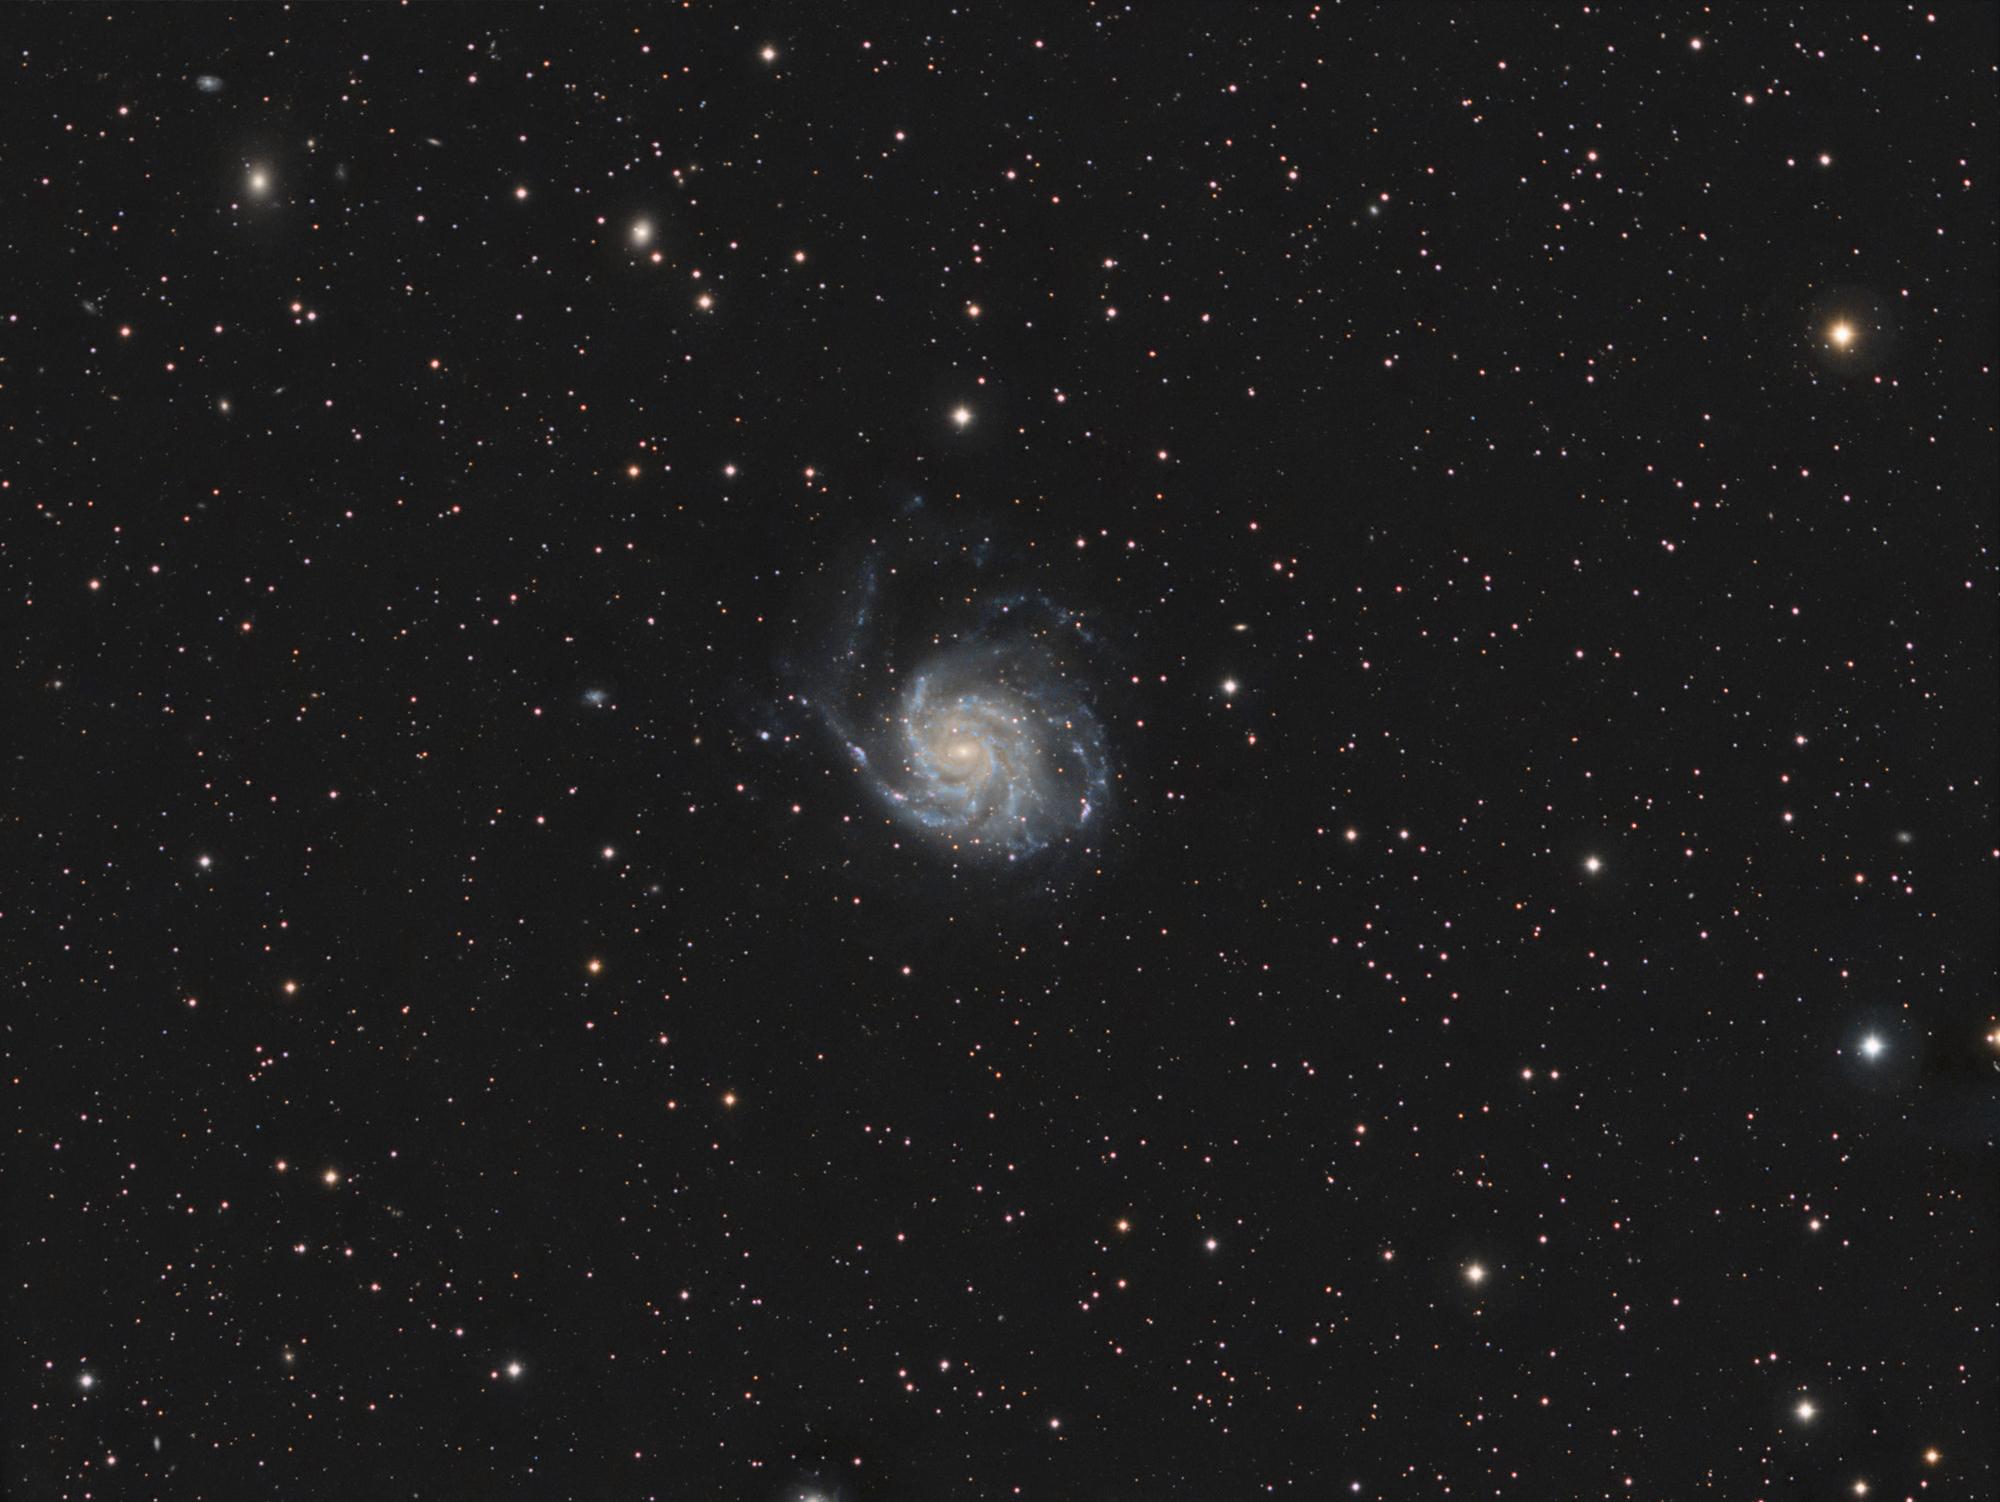 M101 full frame. Click to enlarge.